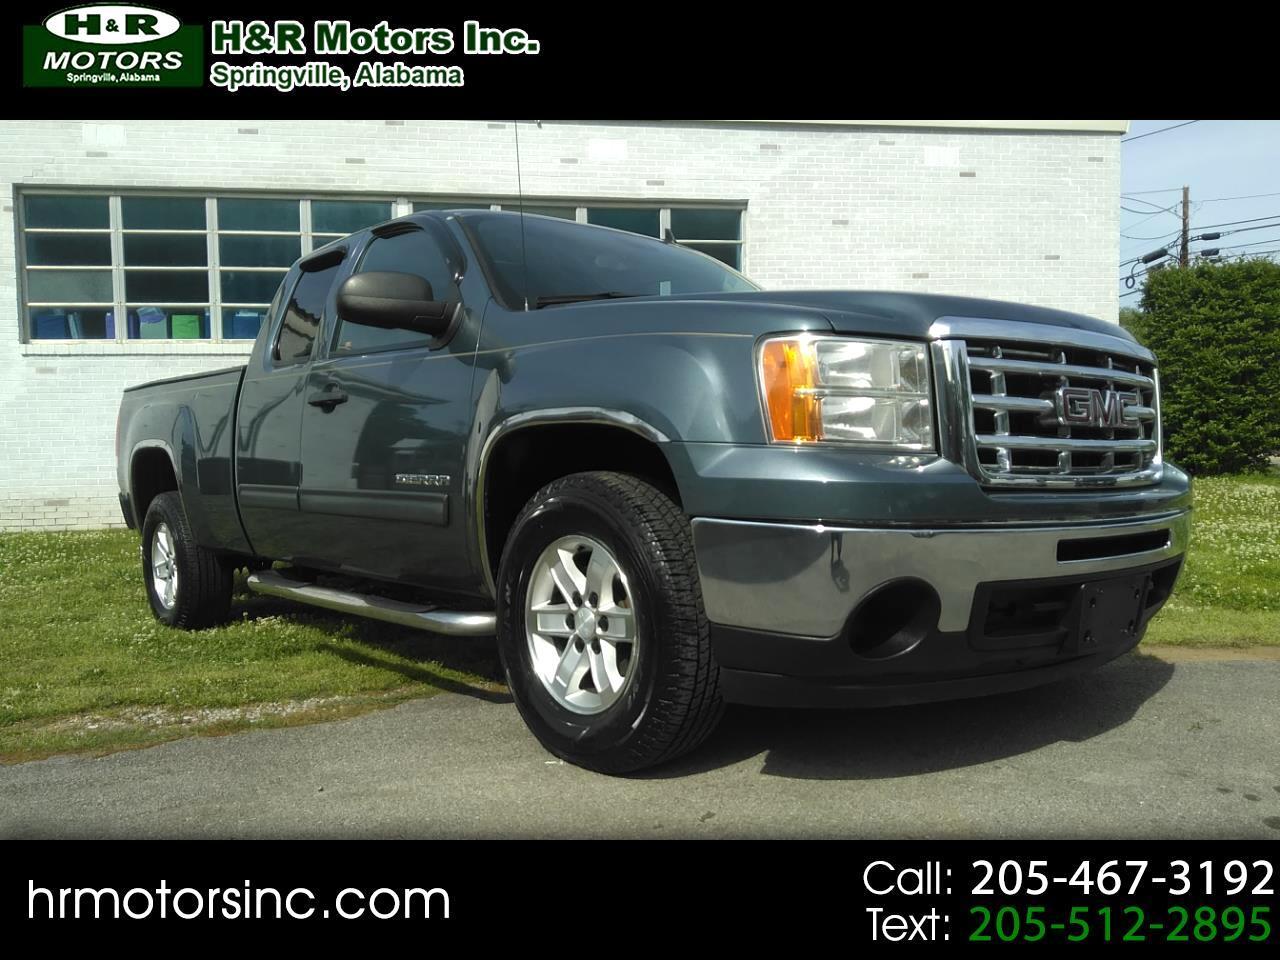 2010 GMC Sierra 1500 1500 SLE